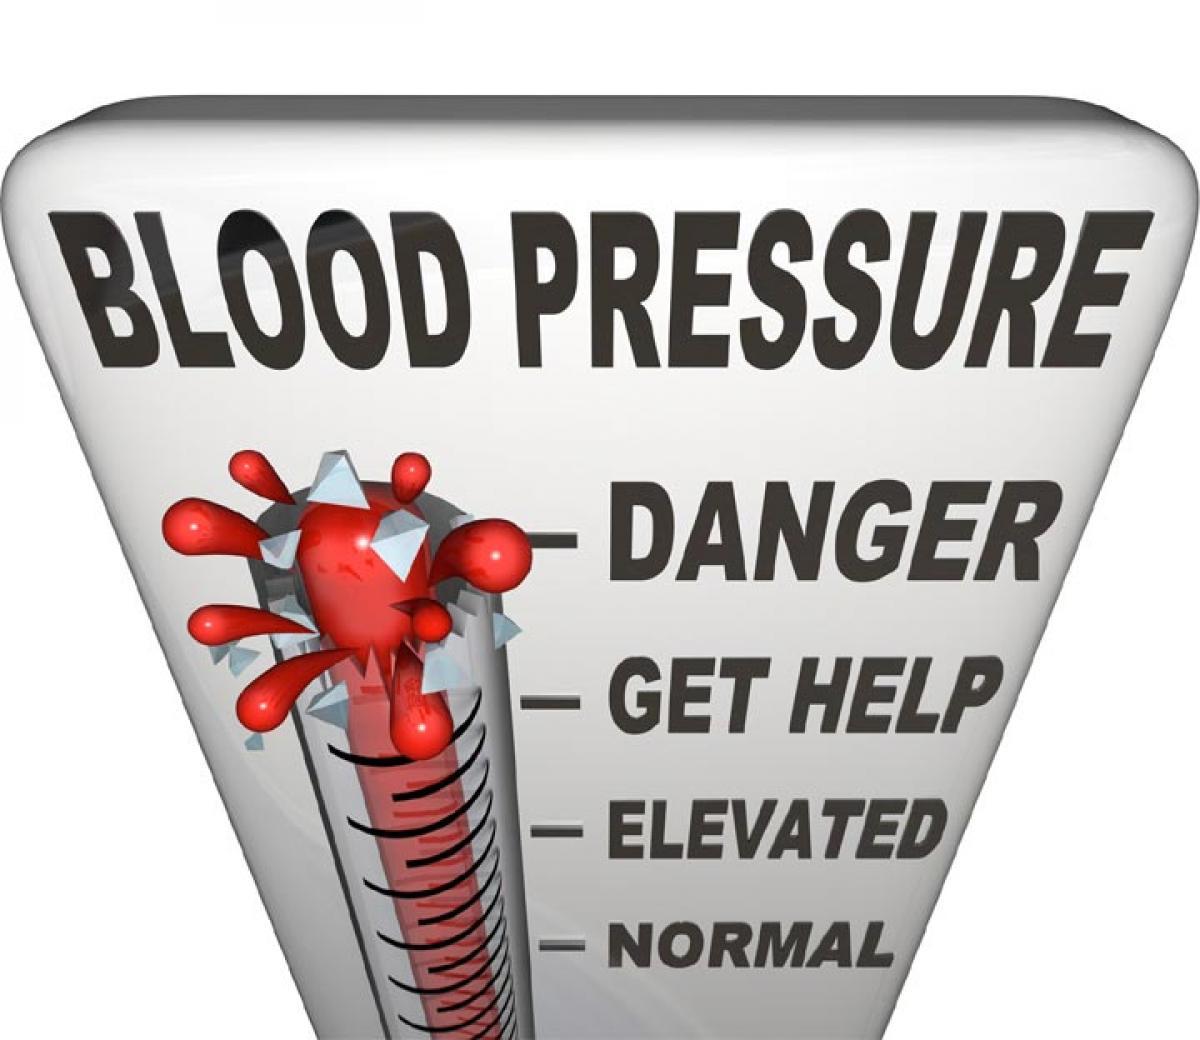 Blood Pressure is a silent killer